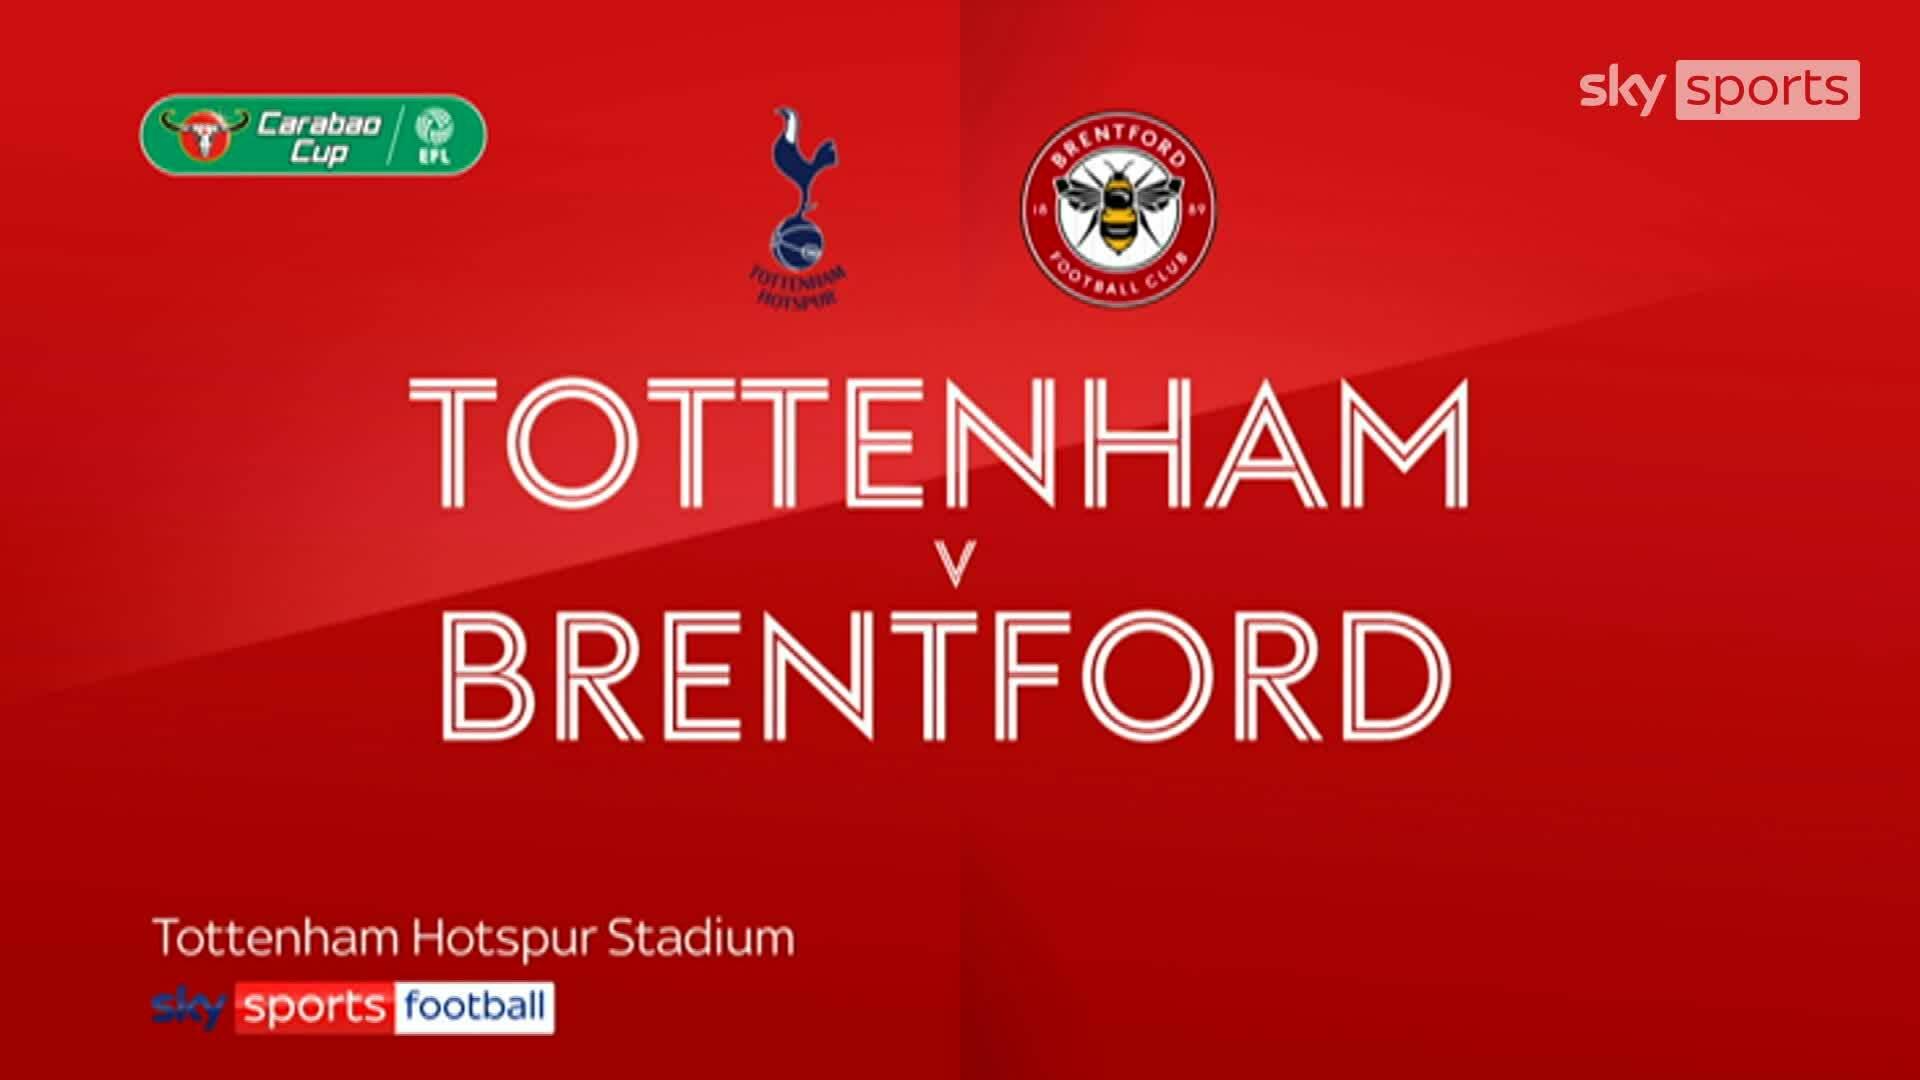 Tottenham 2-0 Brentford